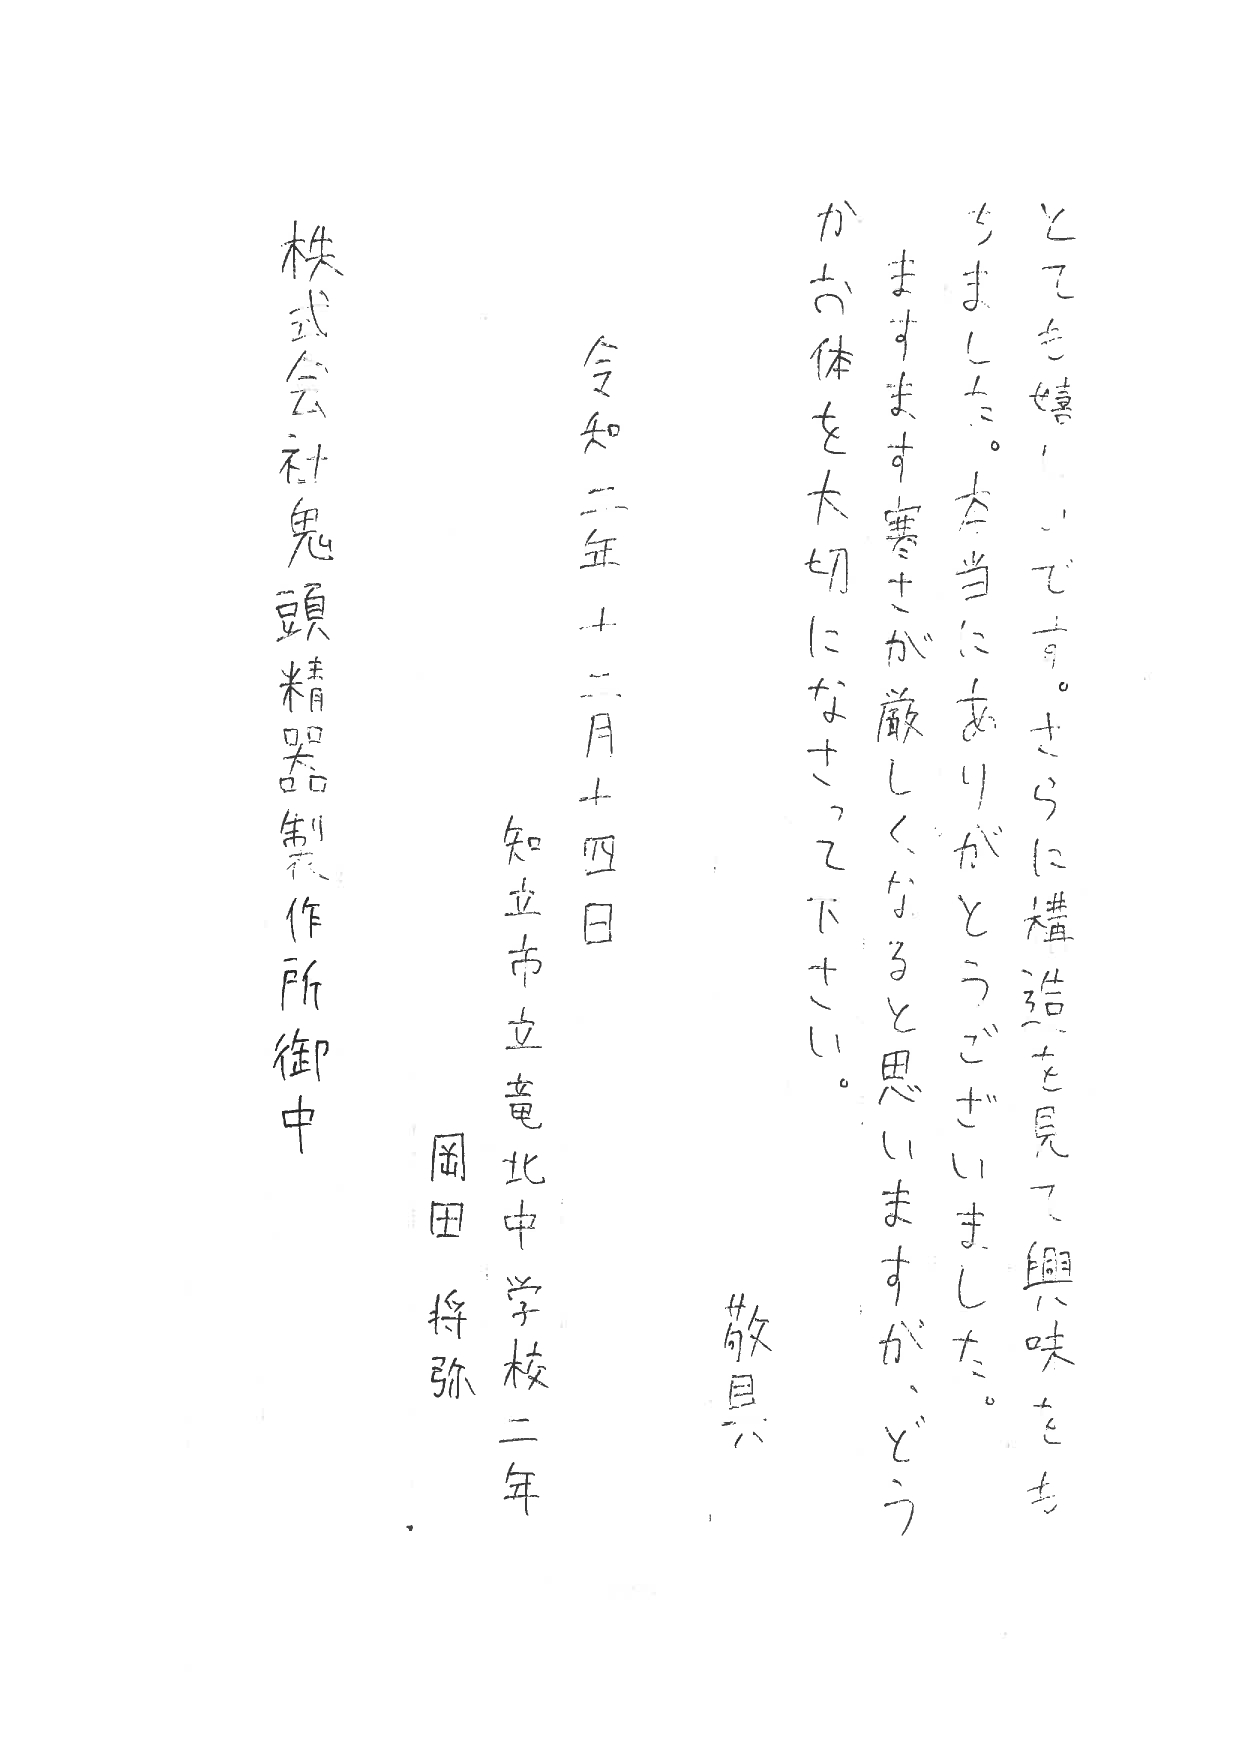 20201216竜北中学校の職場体験活動お礼状-2_page-0004.jpg